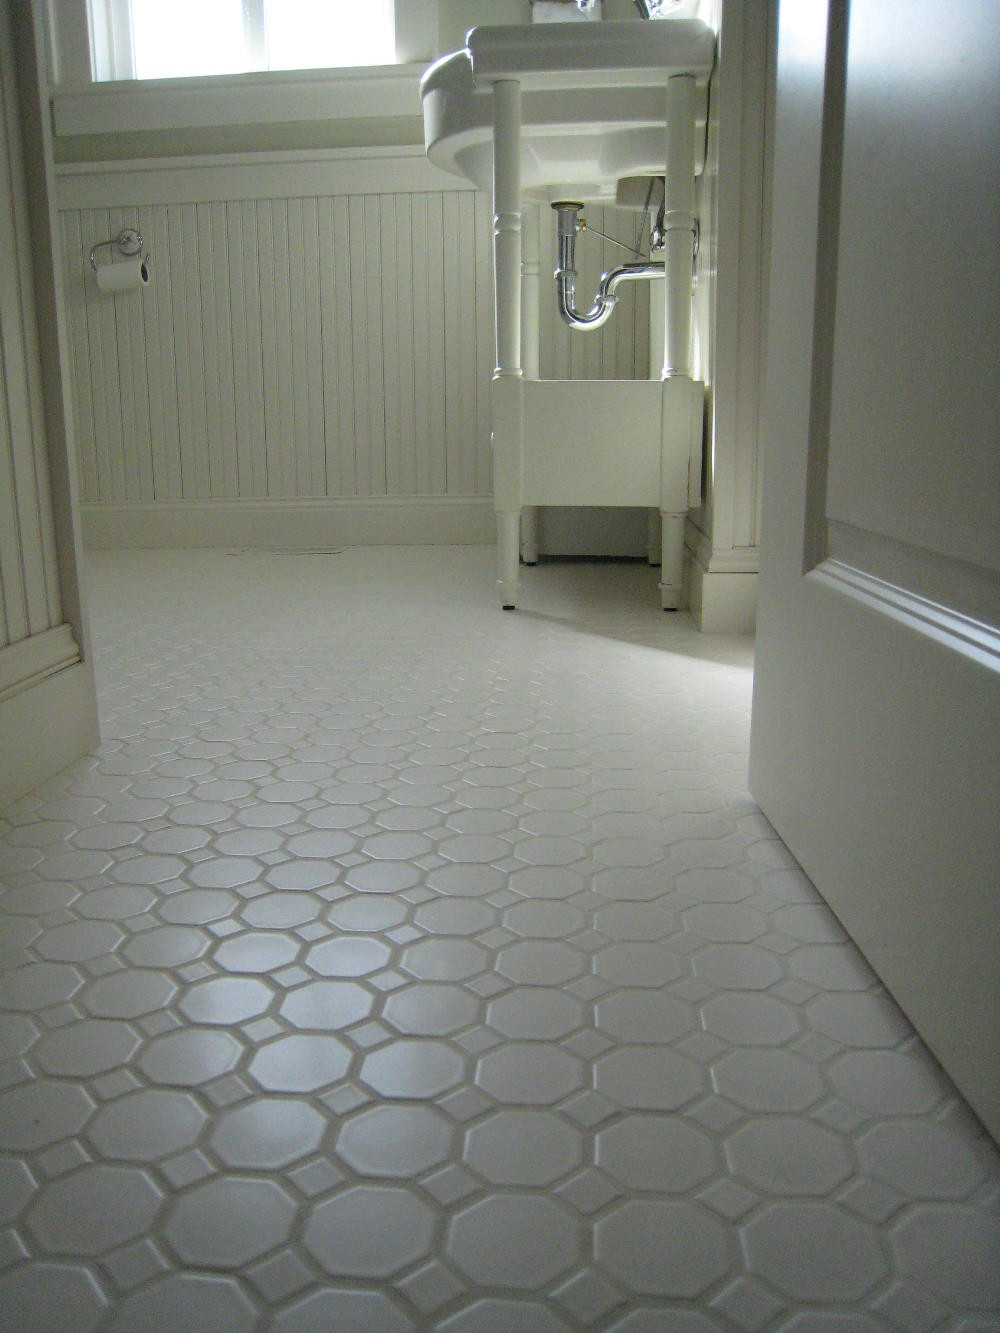 Bathroom Tile Floors  Best Flooring for Bathroom that Enhance the Sophistication